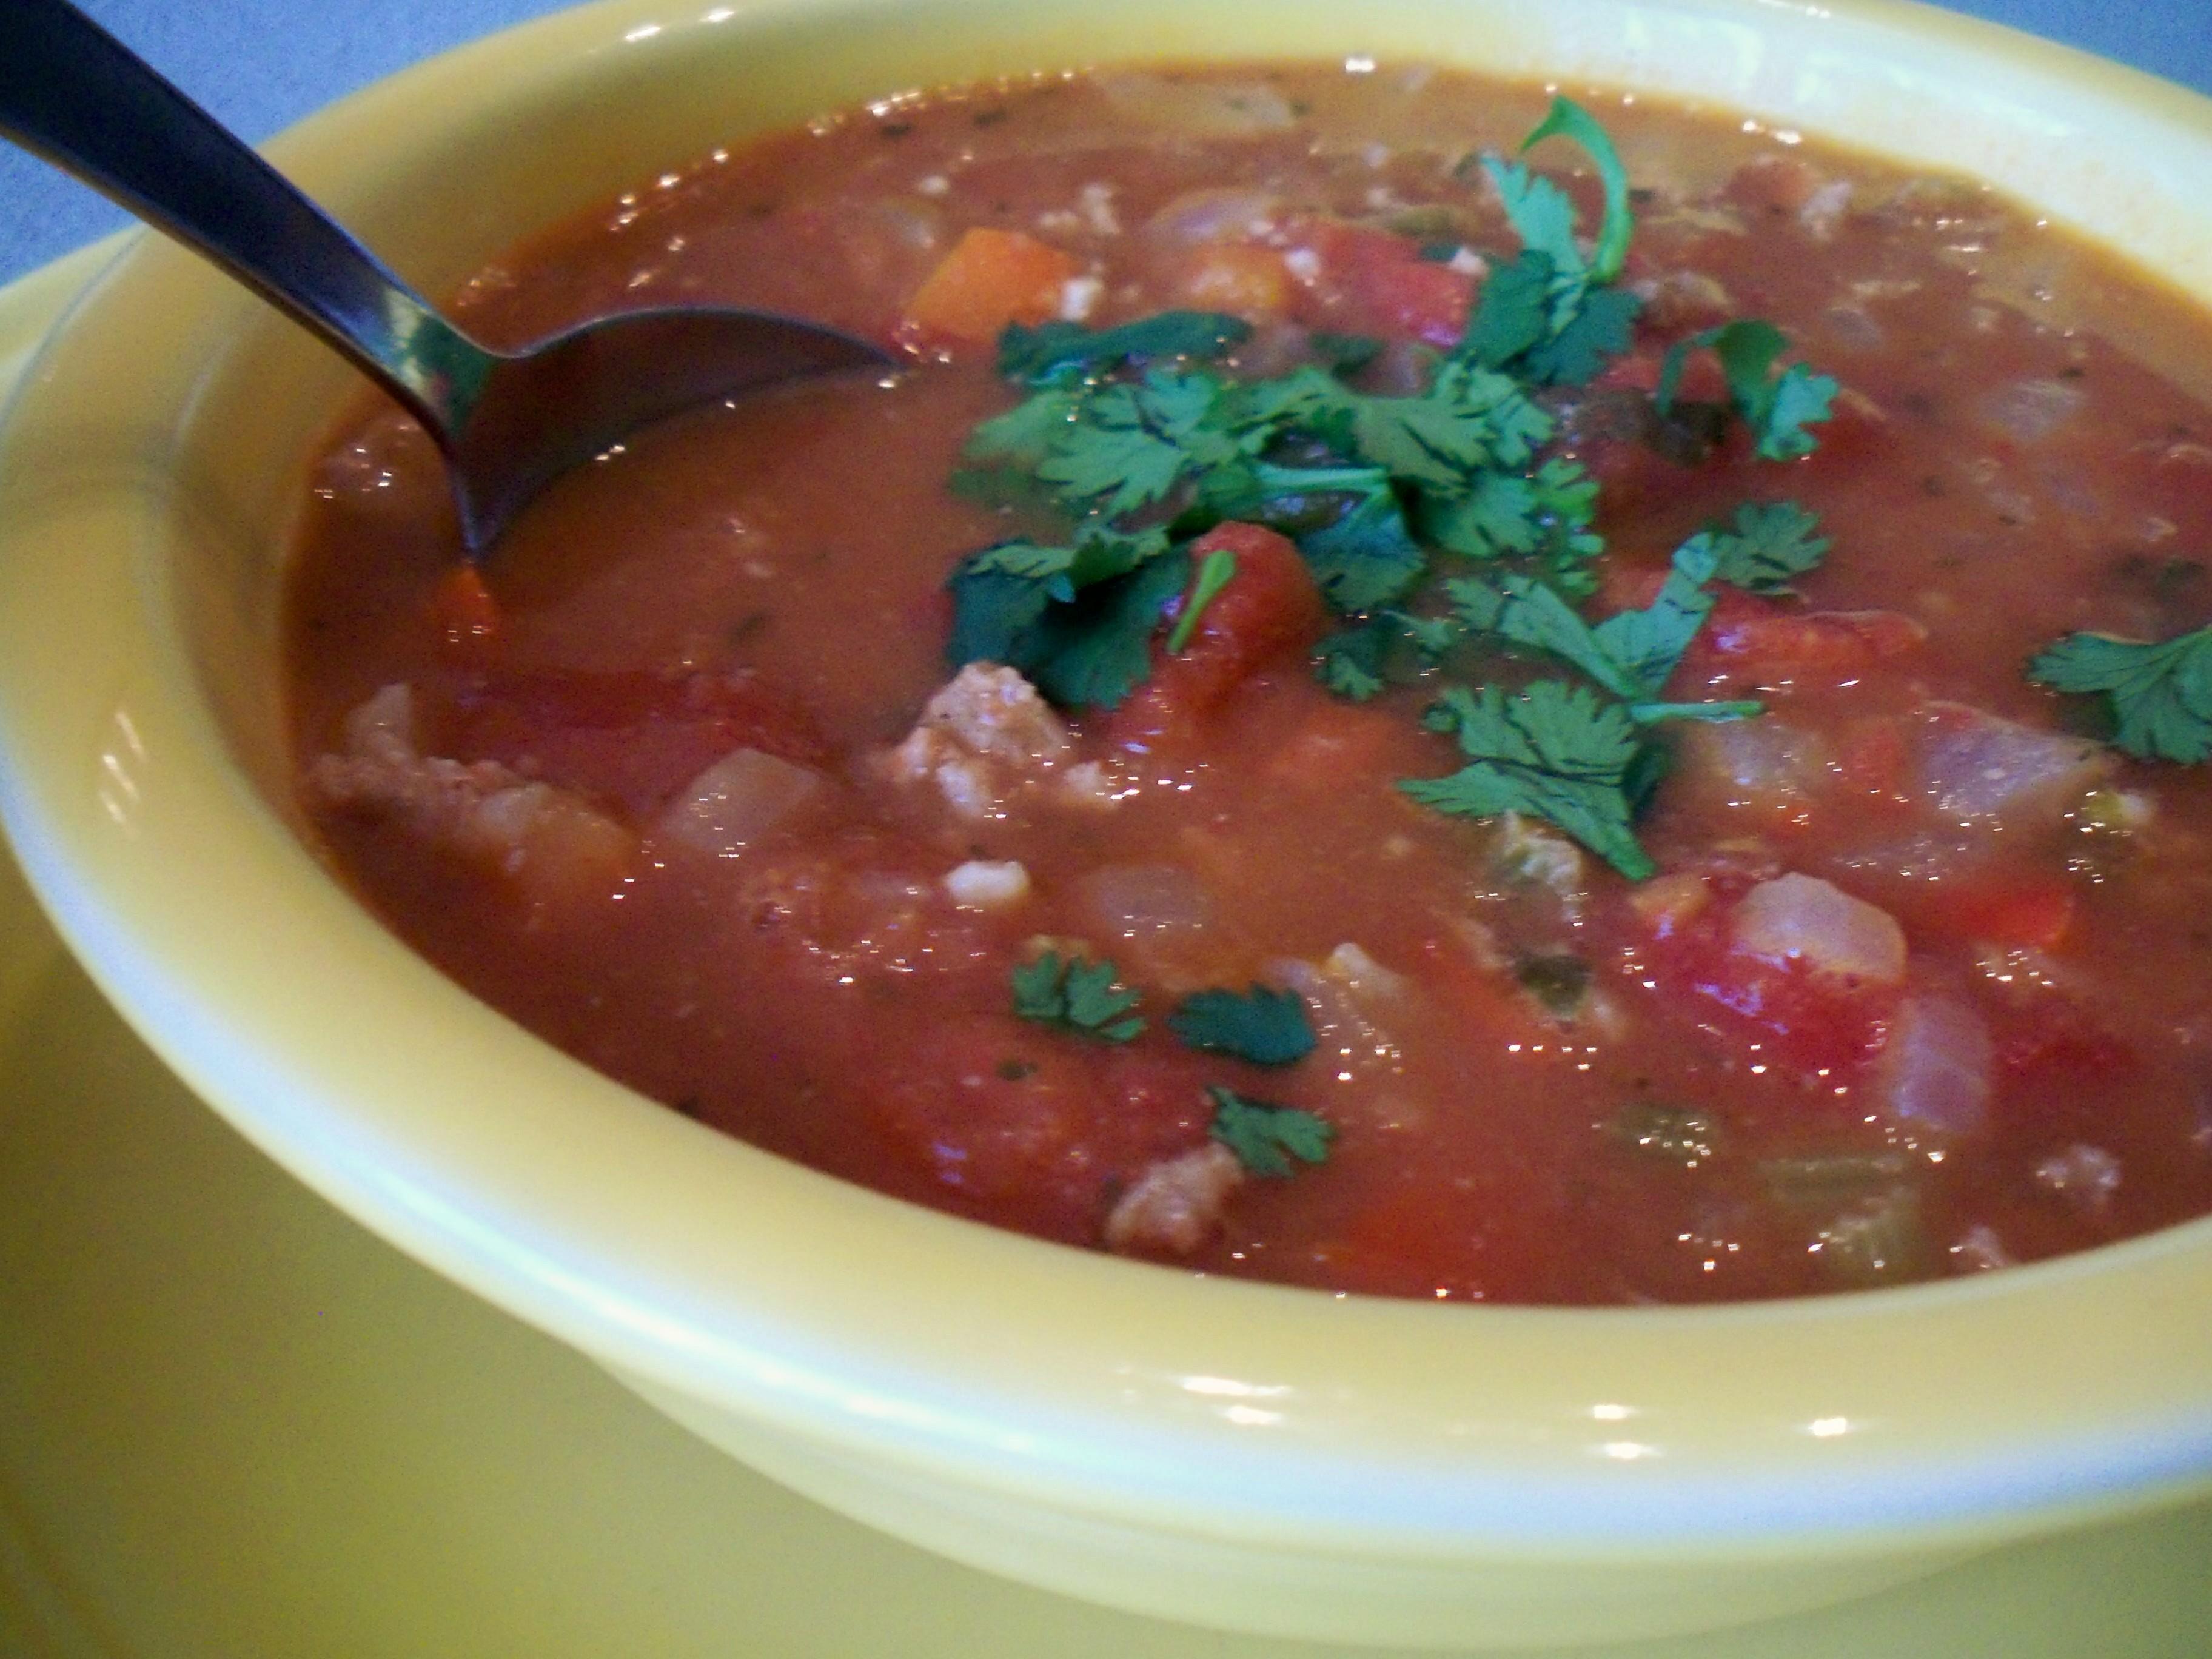 Beefy Refried Bean Soup Recipe